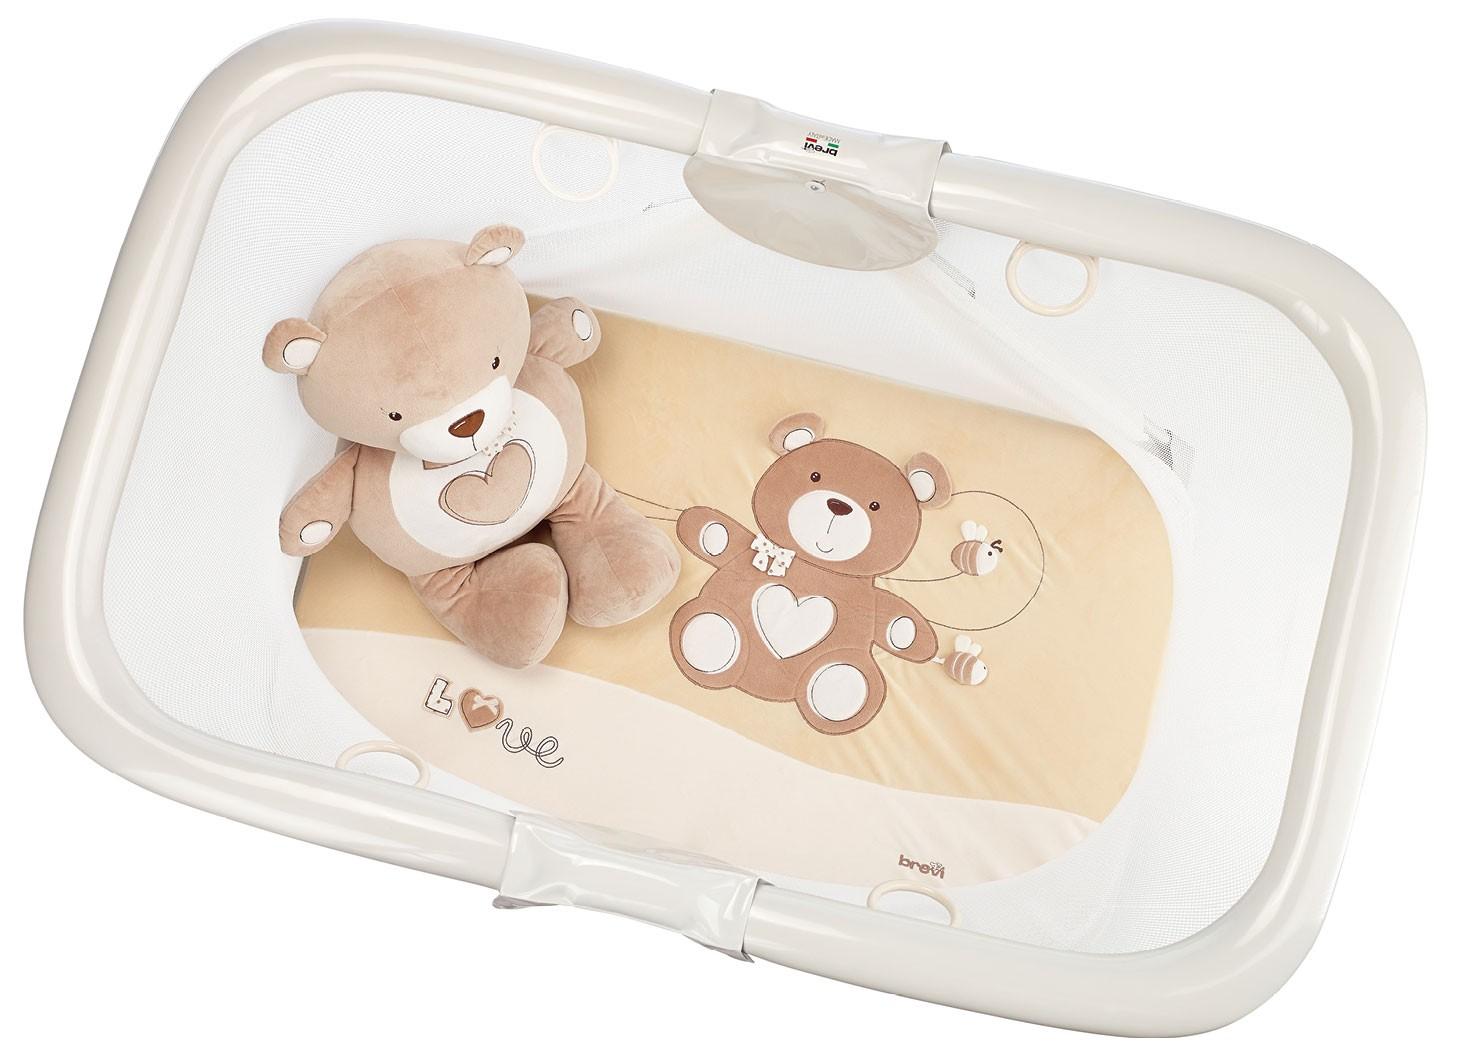 Brevi Parc bébé Circus Soft e Play My Little Bear